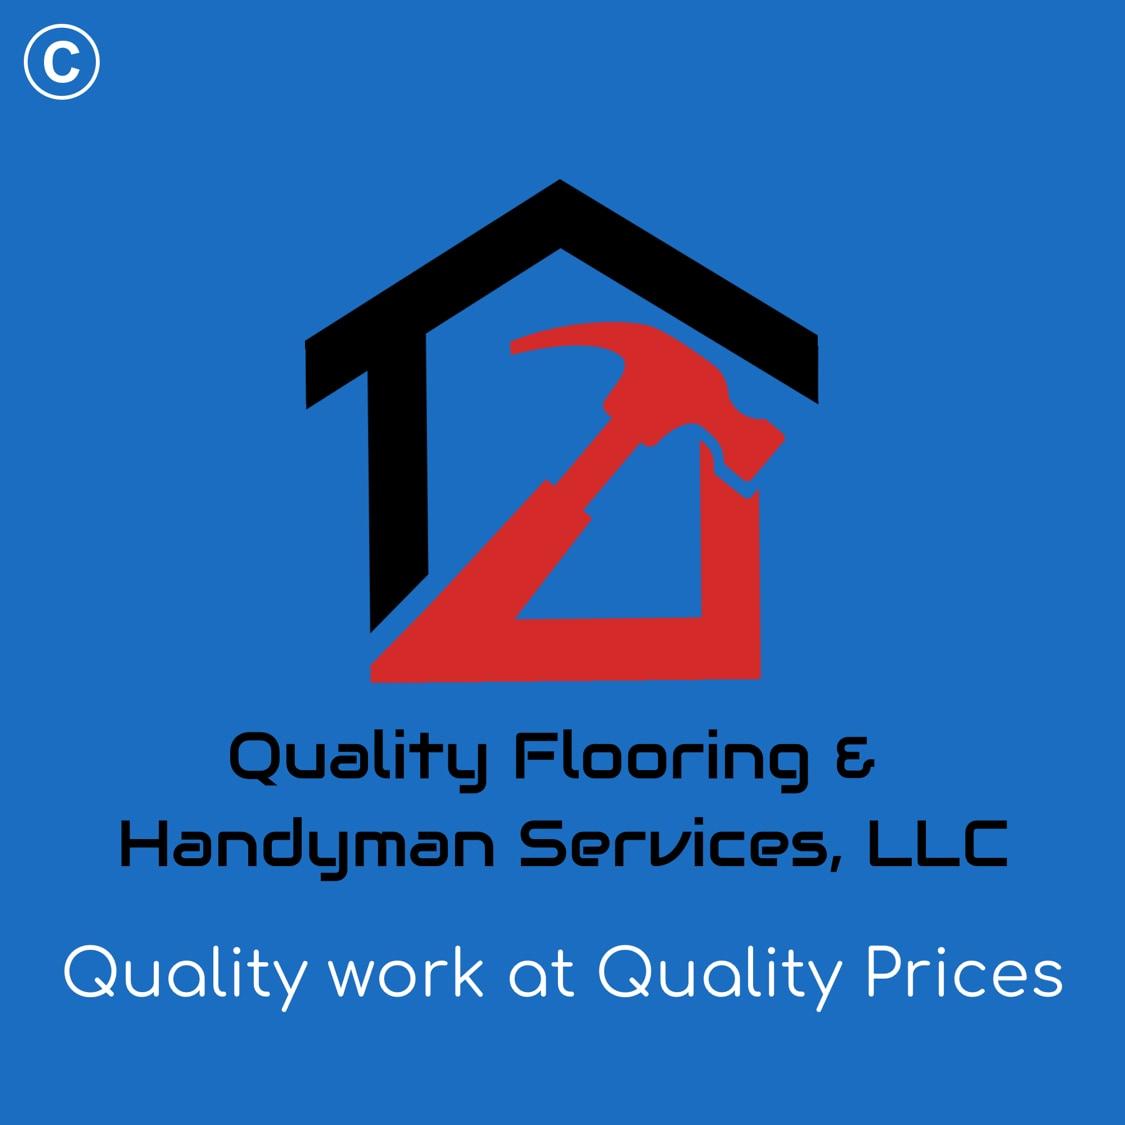 Quality Flooring & Handyman Services, LLC